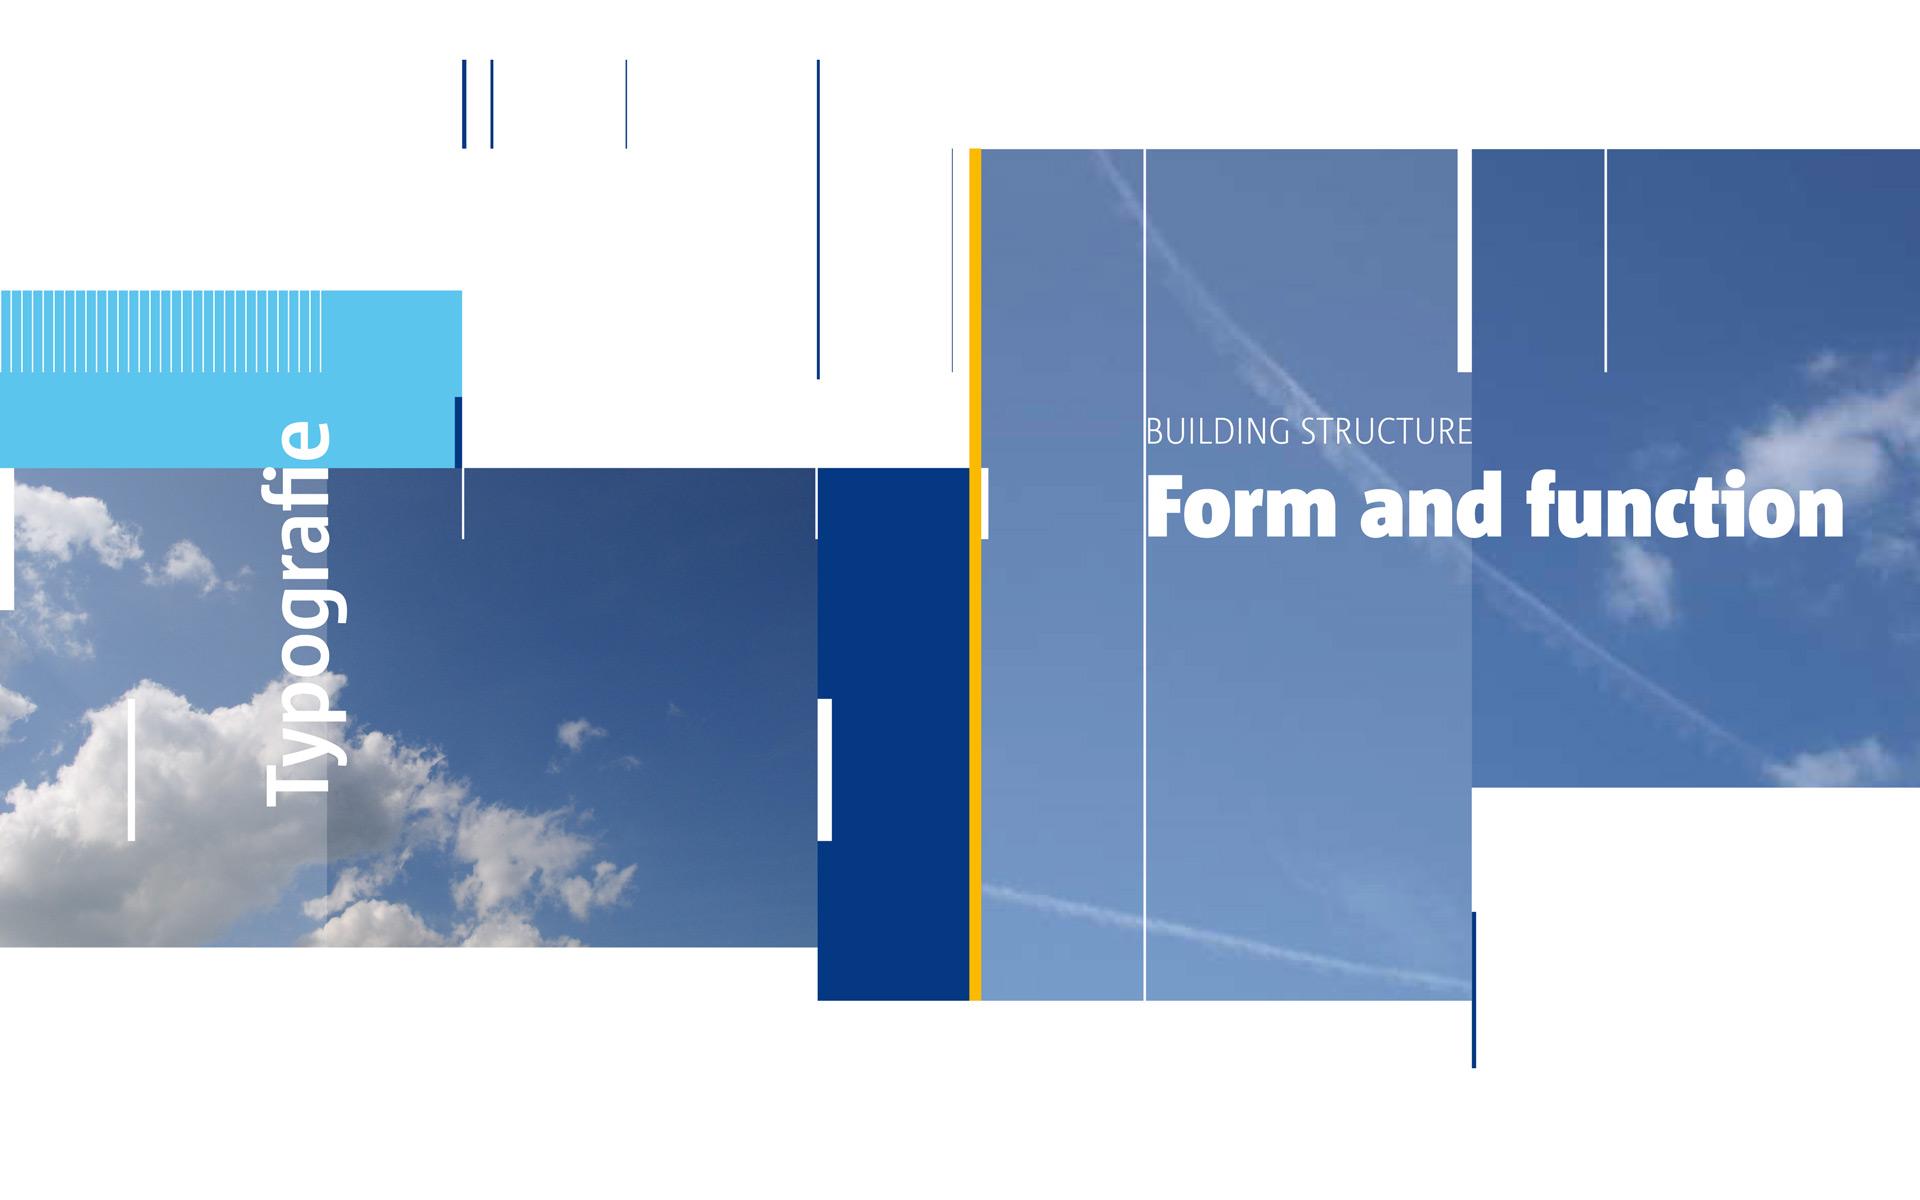 EASA Corporate Design, Gestaltungselement, vertikale Linien und Flächentektonik